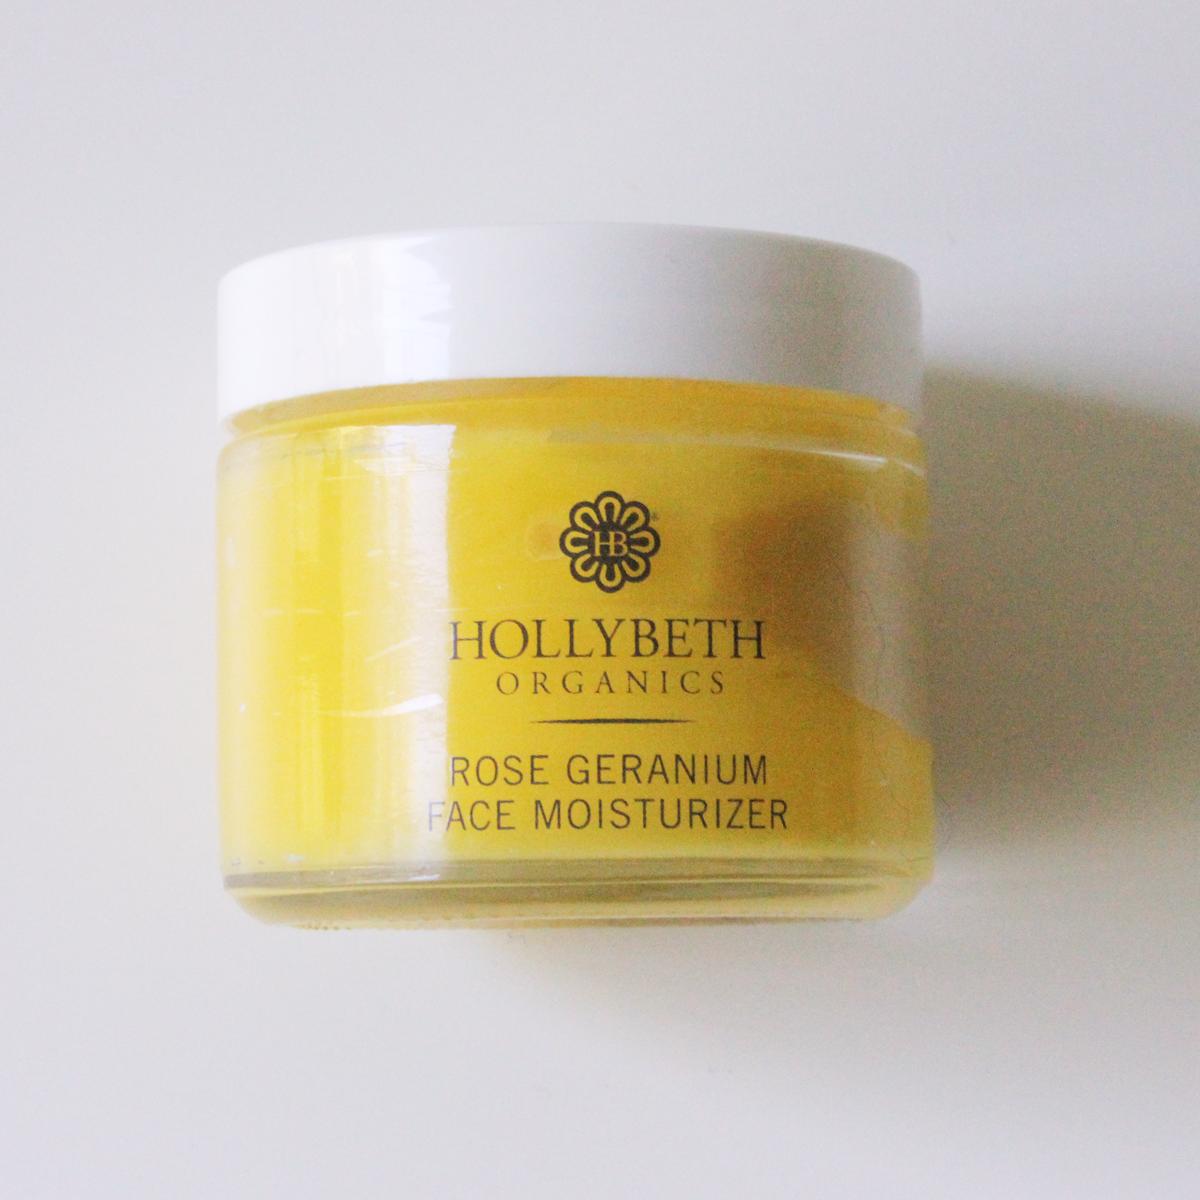 Hollybeth-Organics-Review